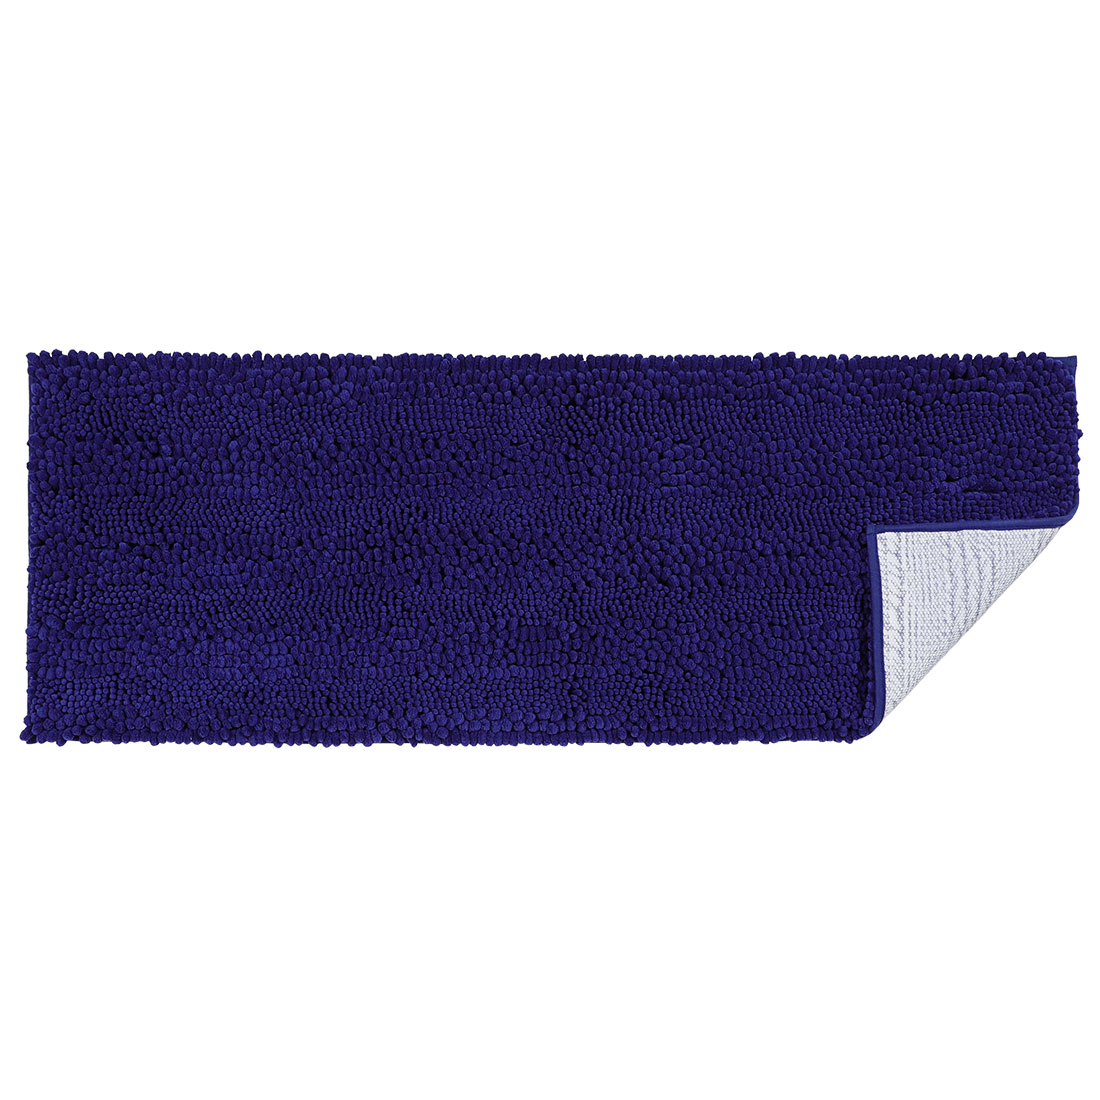 17 x 47 Inch Luxury Soft Plush Shaggy Bath Mat Chenille Rug Carpet Navy Blue